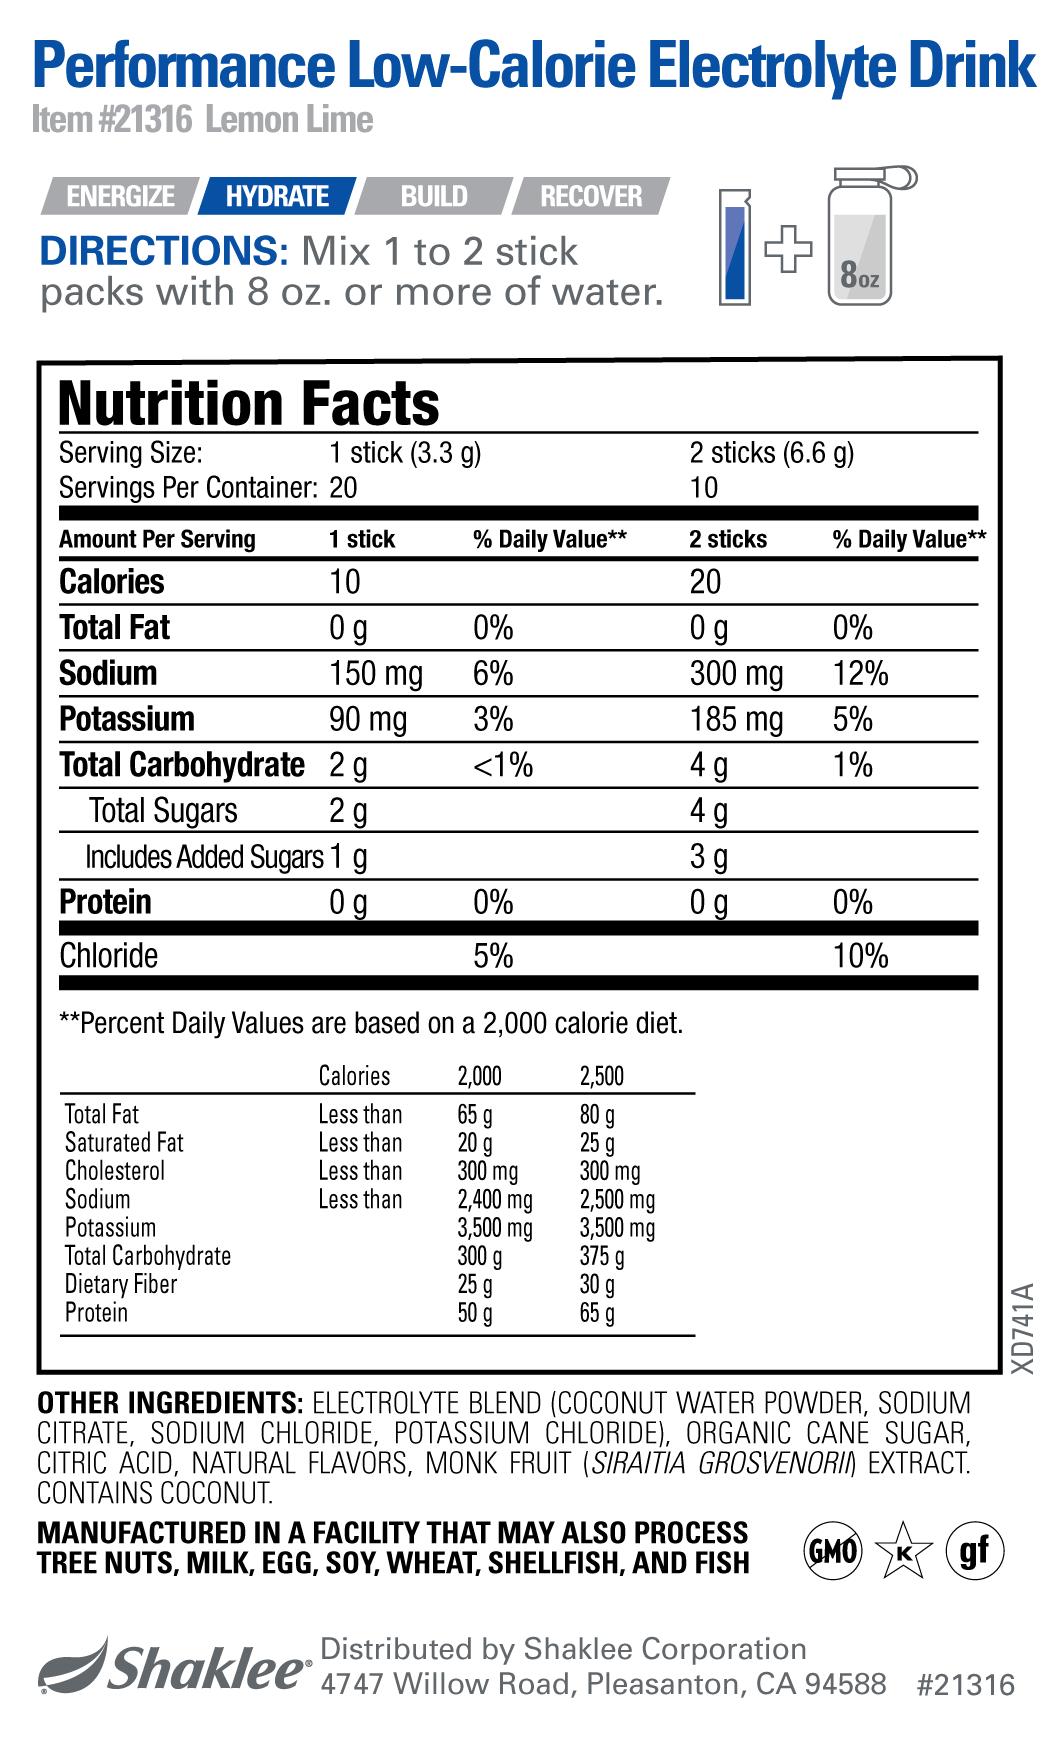 Performance Low-Calorie Electrolyte Drink LEMON-LIME